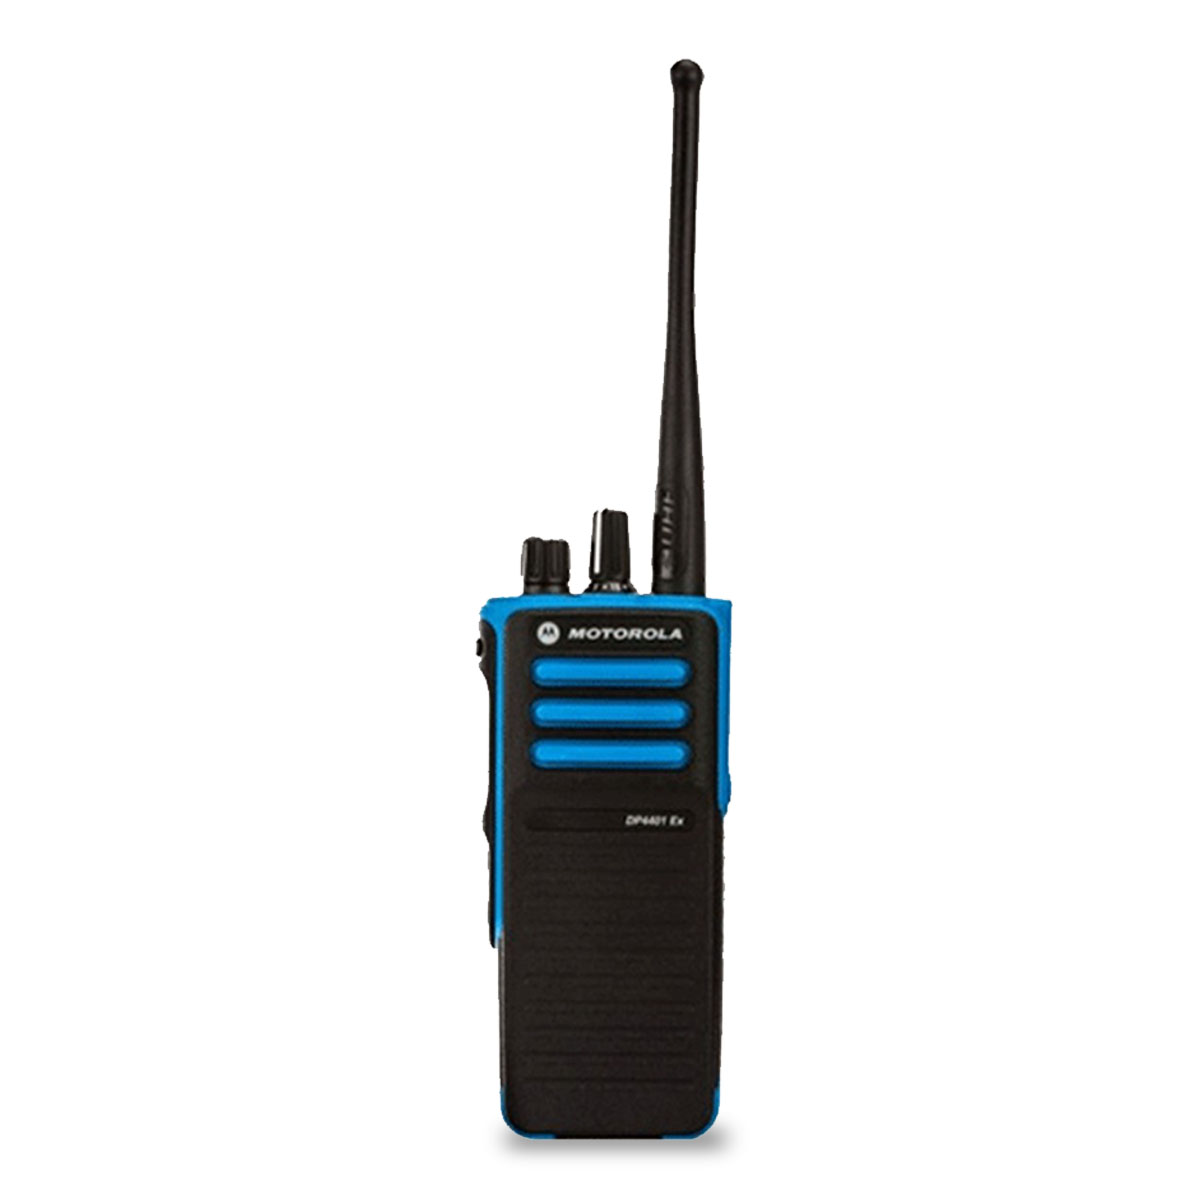 Radio Motorola DGP8050EX Digital